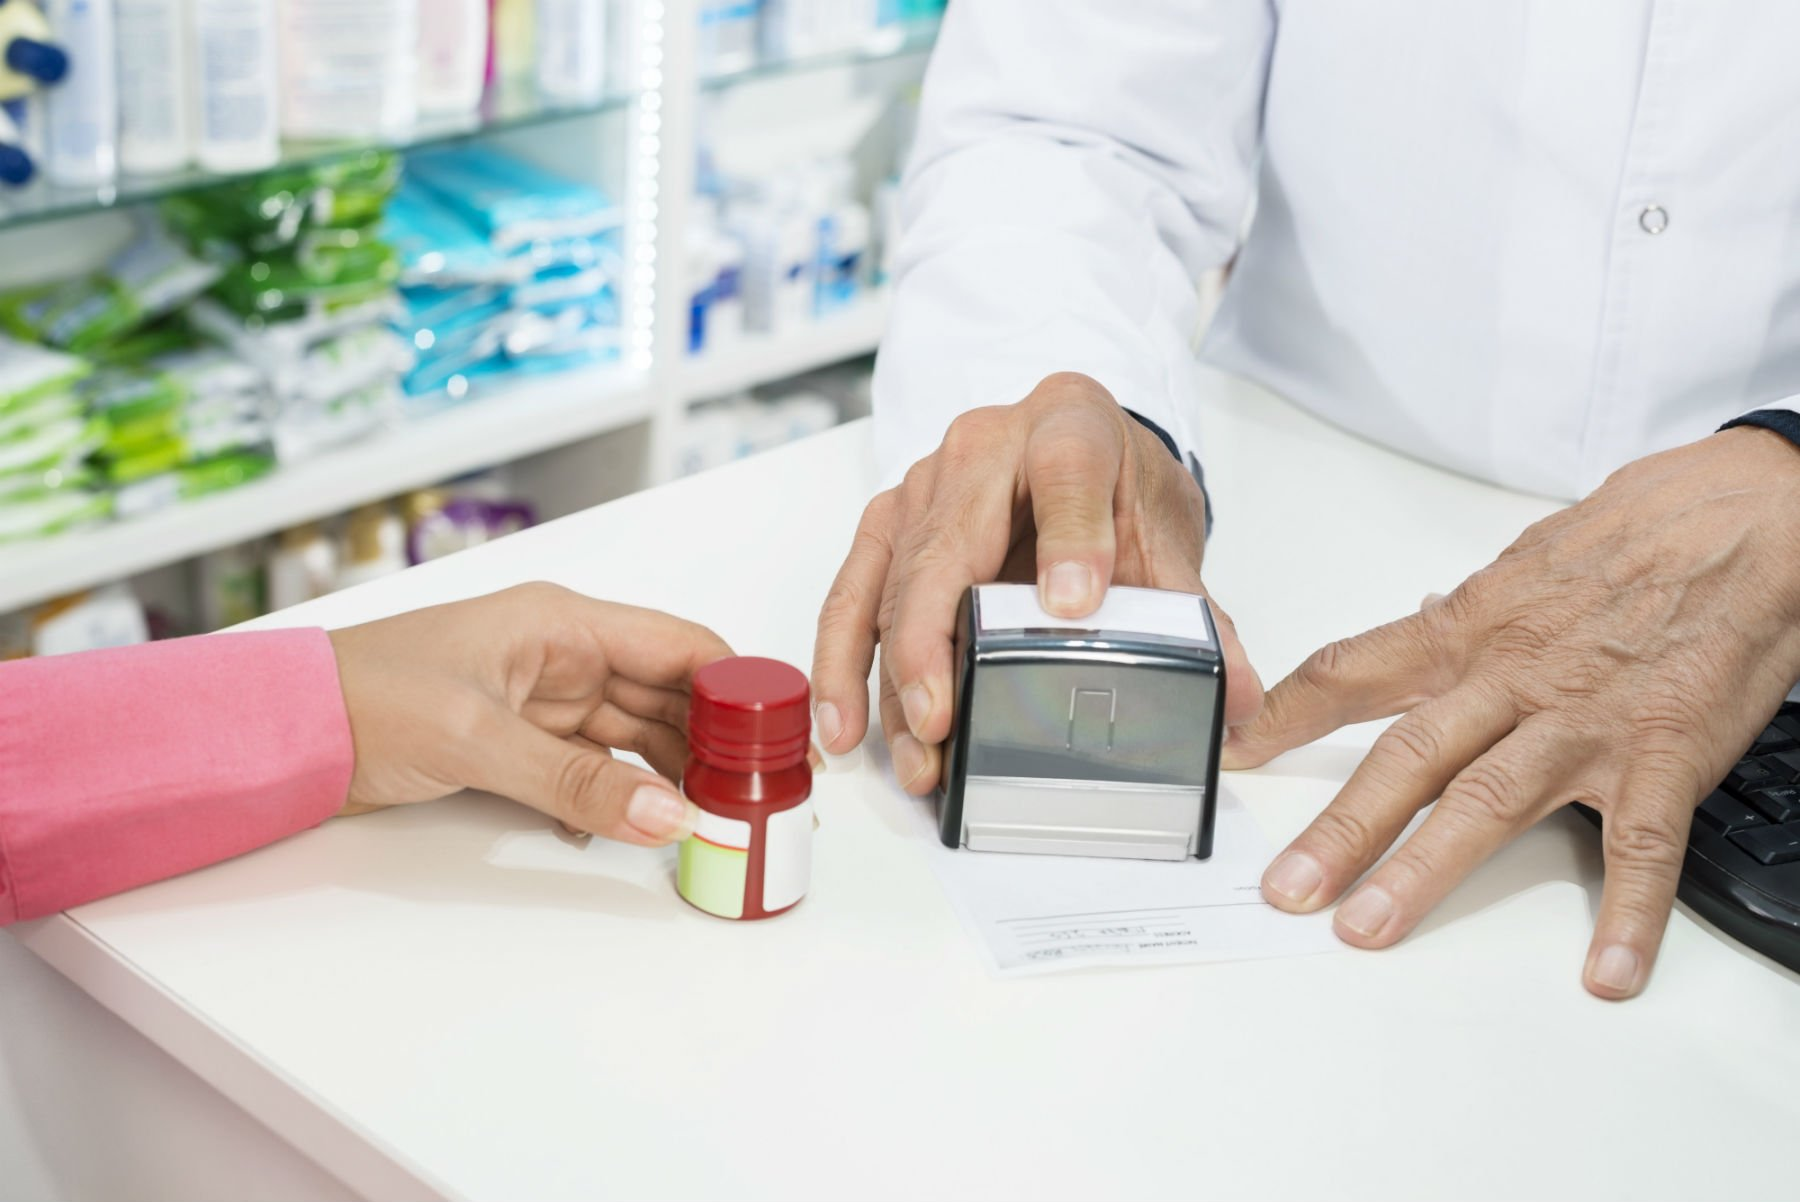 bancone vendita farmacia